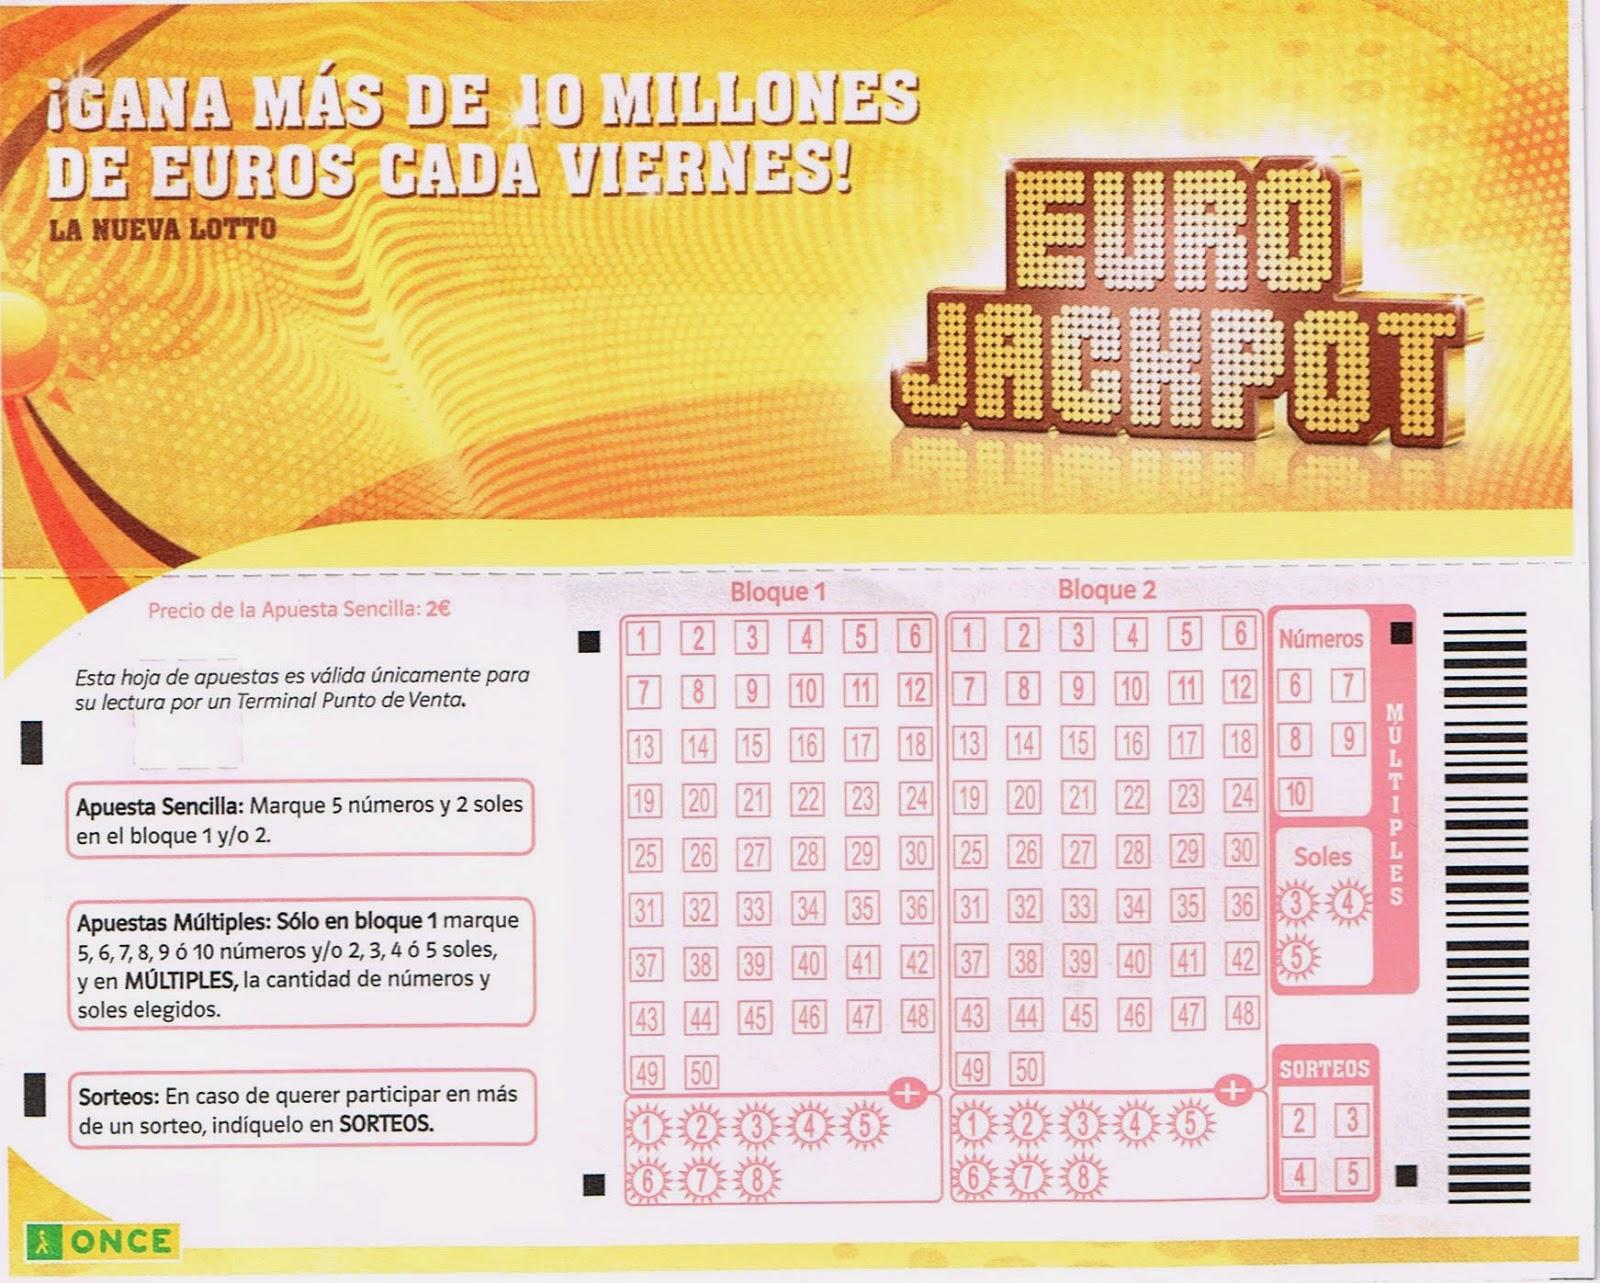 eurojackpot once